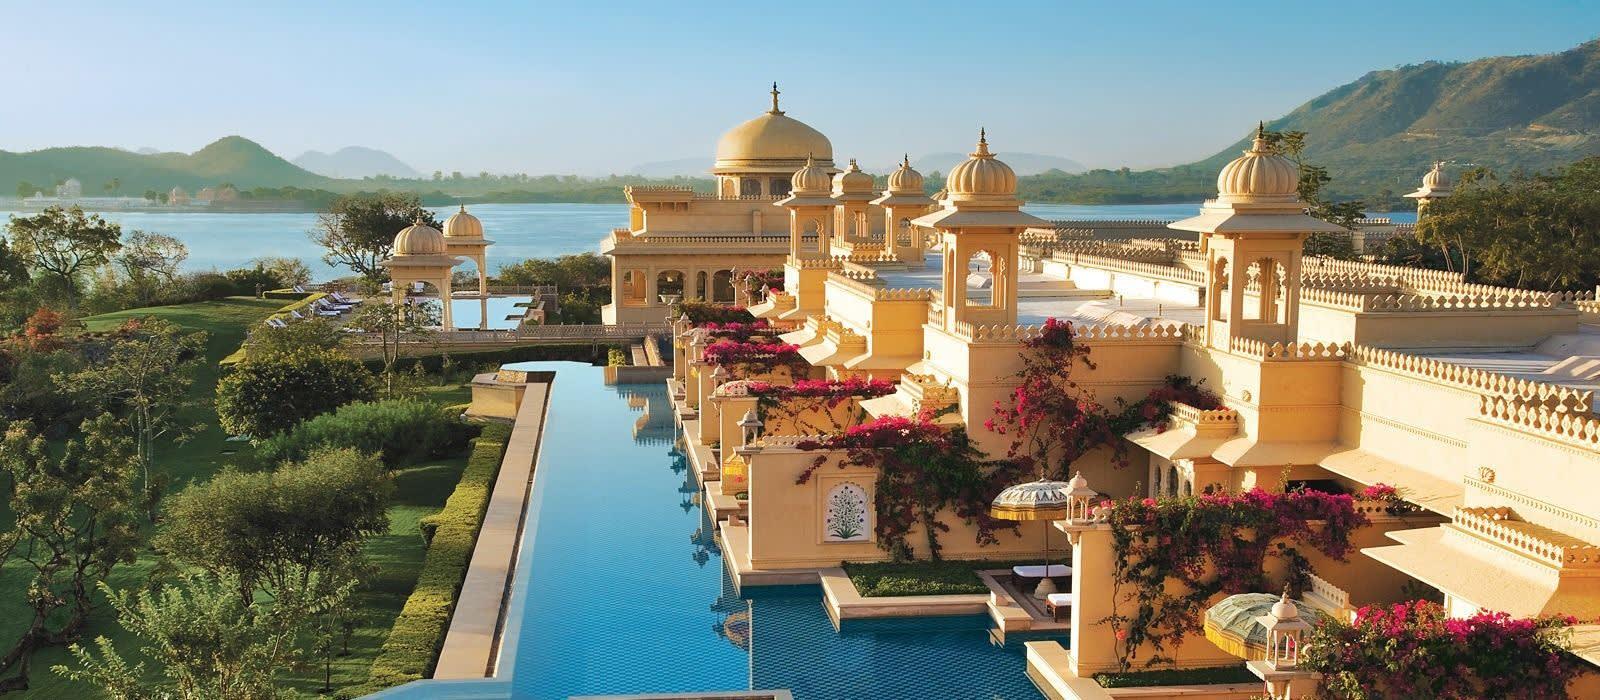 Hotel-Oberoi-Udaivilas-North-India - India travel guide